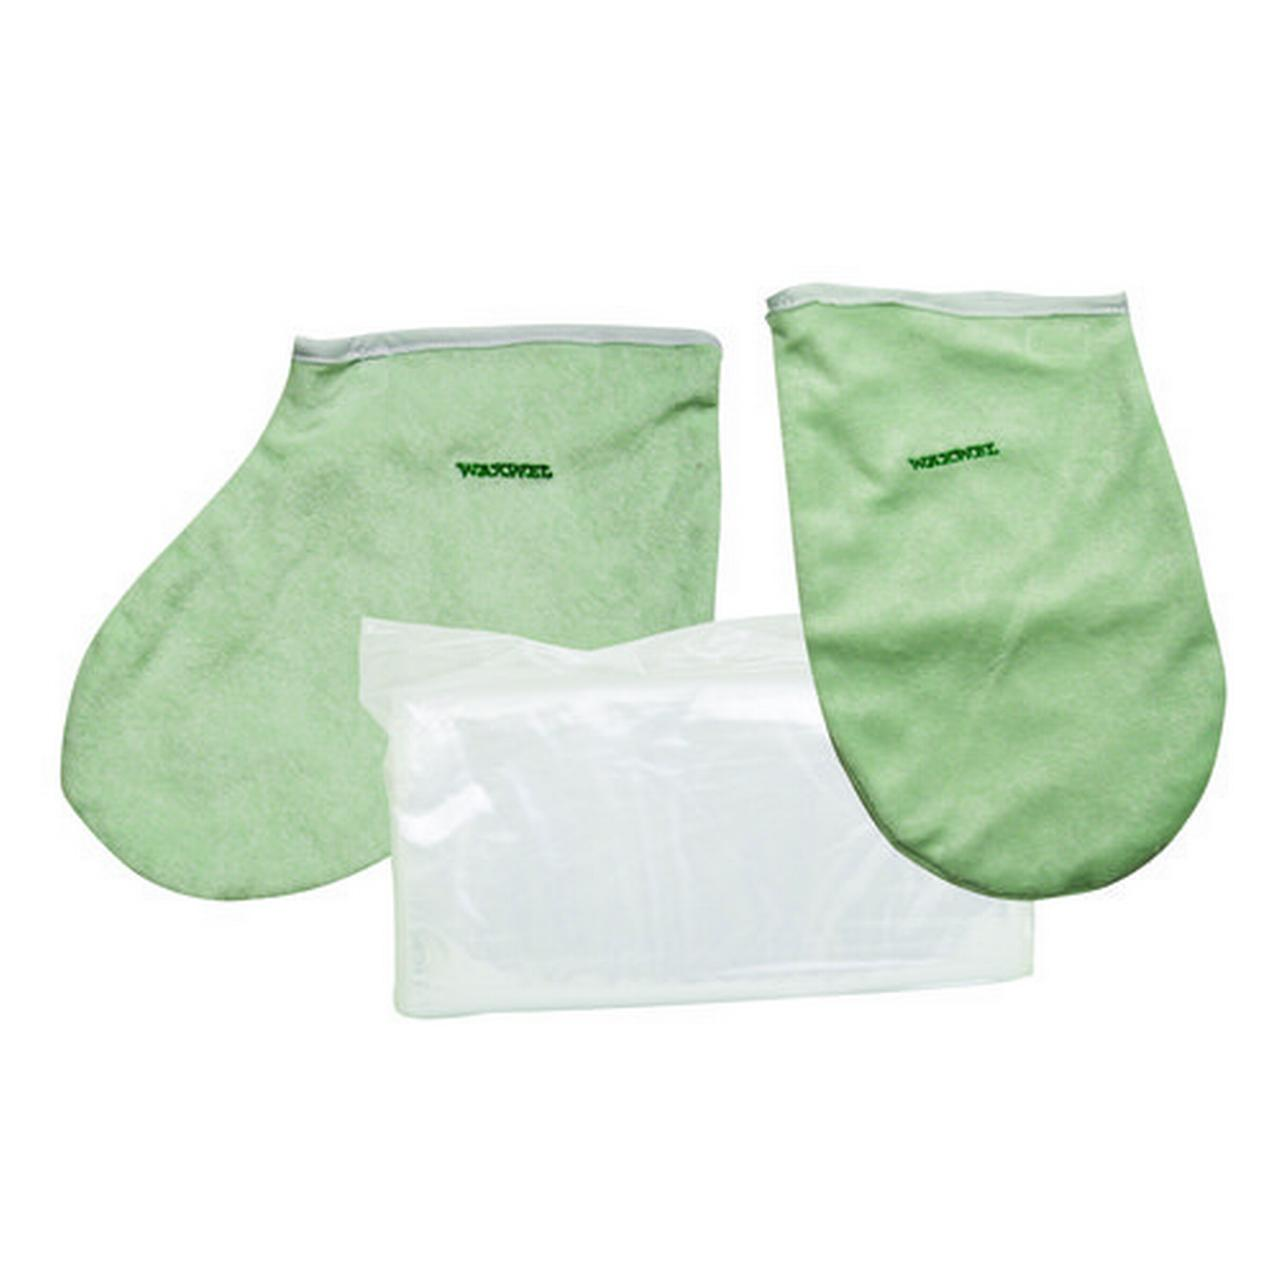 Bioenergizer detox foot spa detox spa system walmart nvjuhfo Choice Image